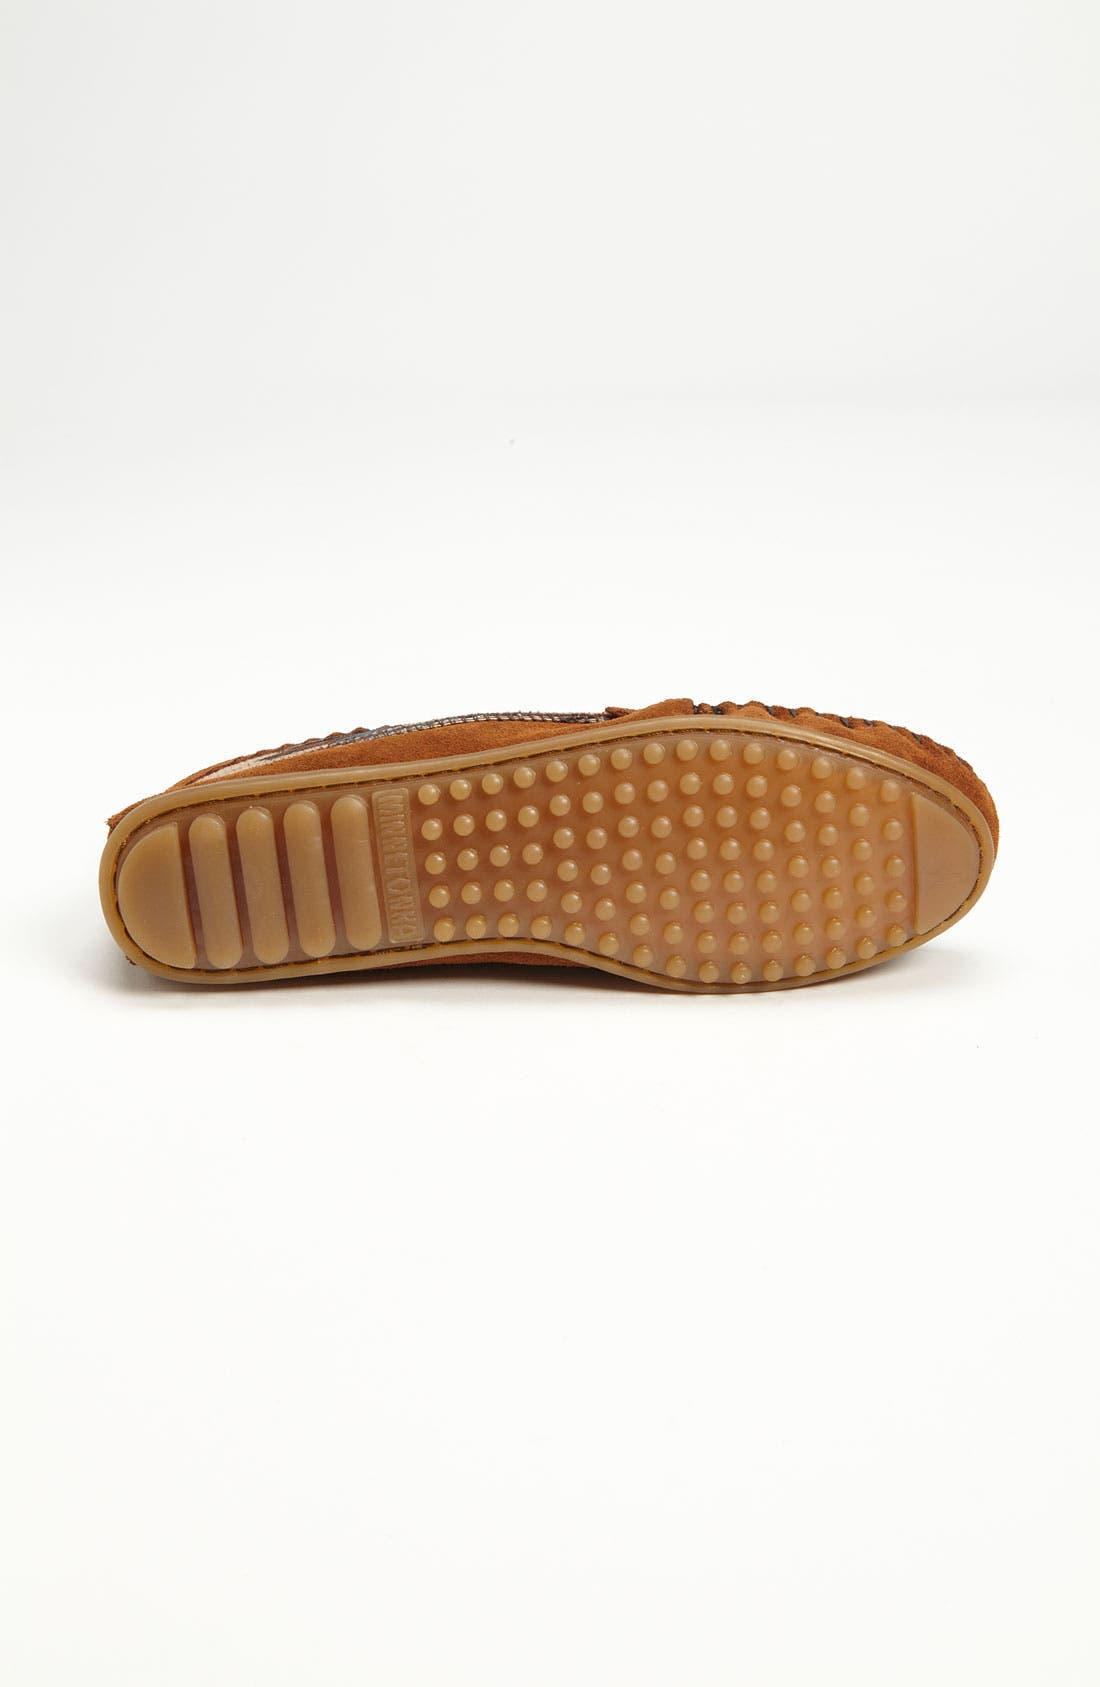 'El Paso' Ankle Boot,                             Alternate thumbnail 2, color,                             211